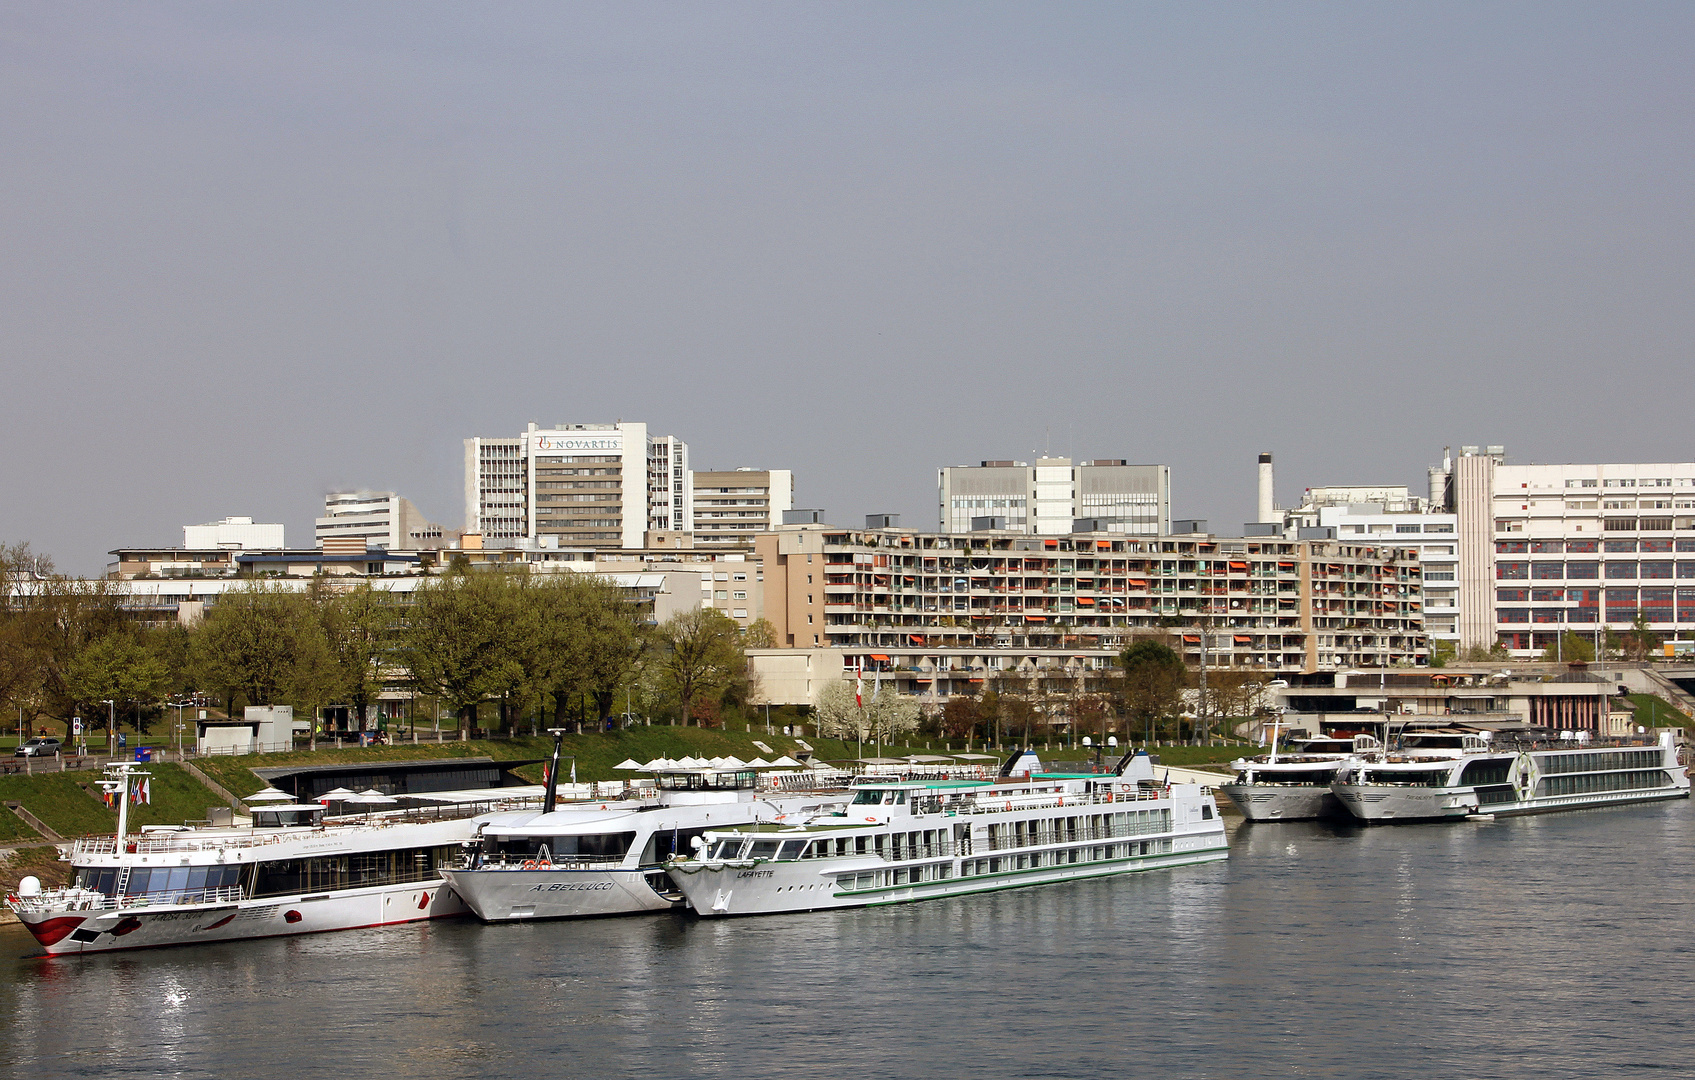 Der Personenhafen St. Johann in Basel